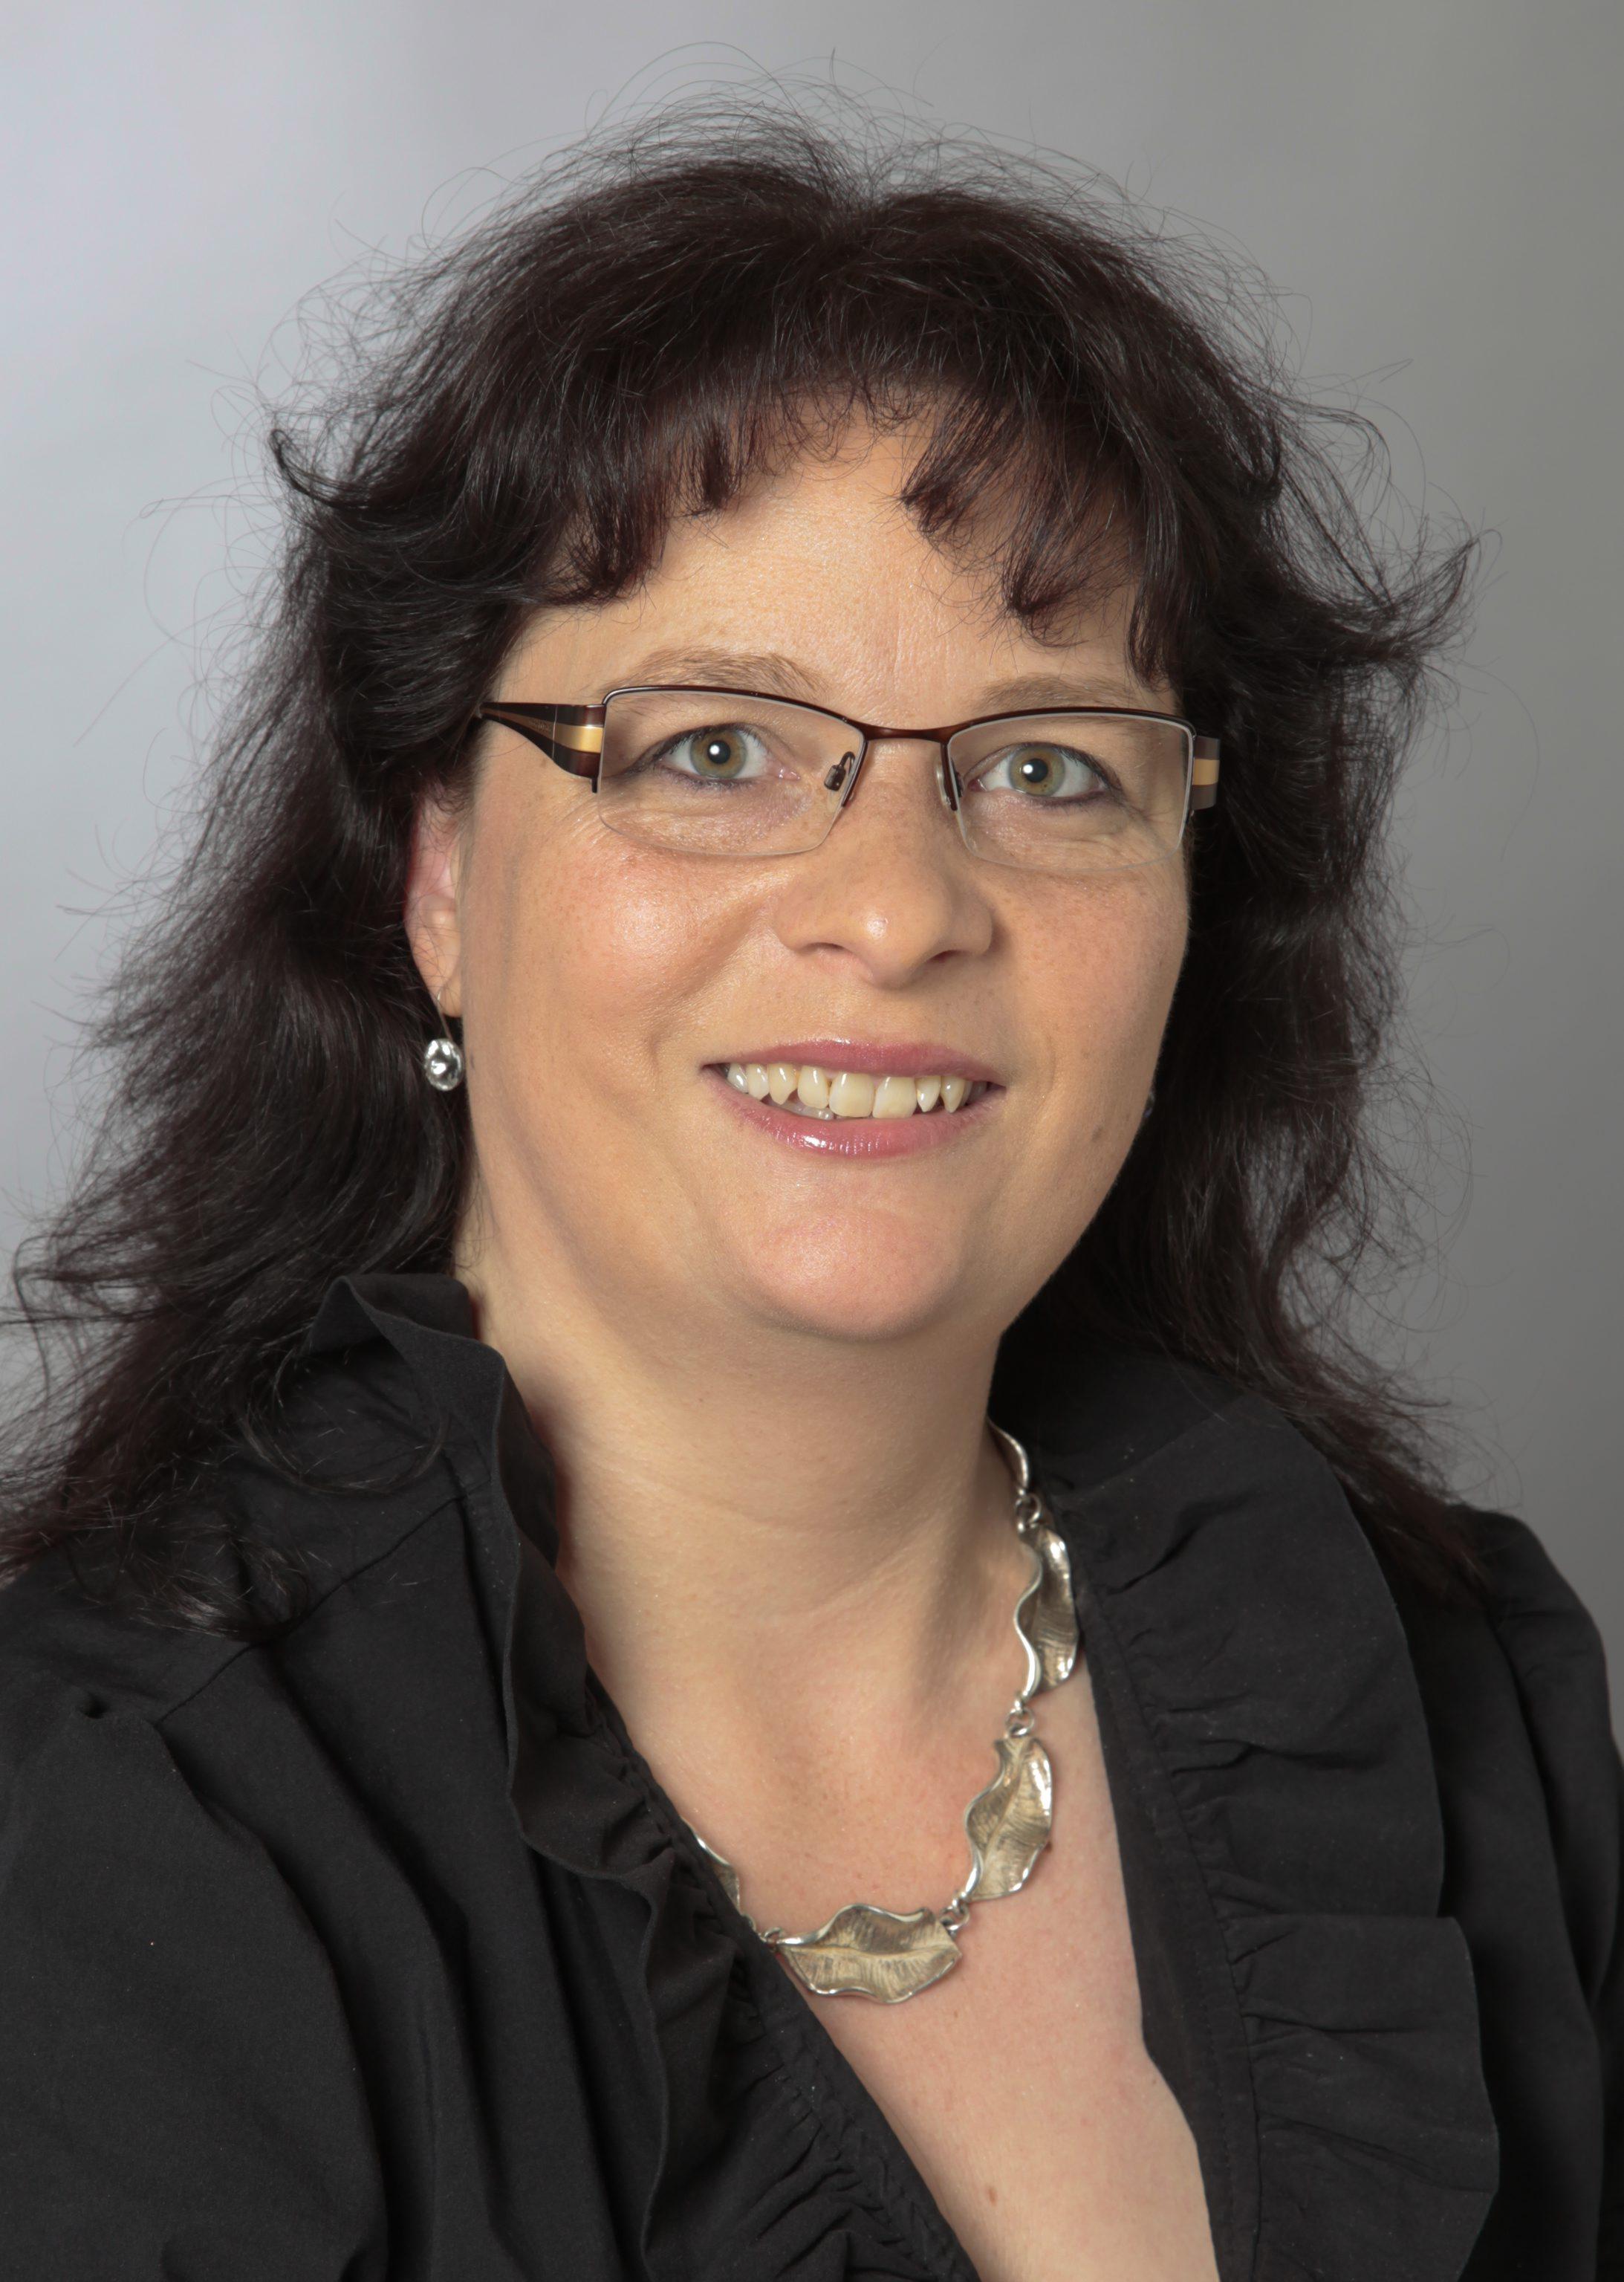 Nicole Leimbach